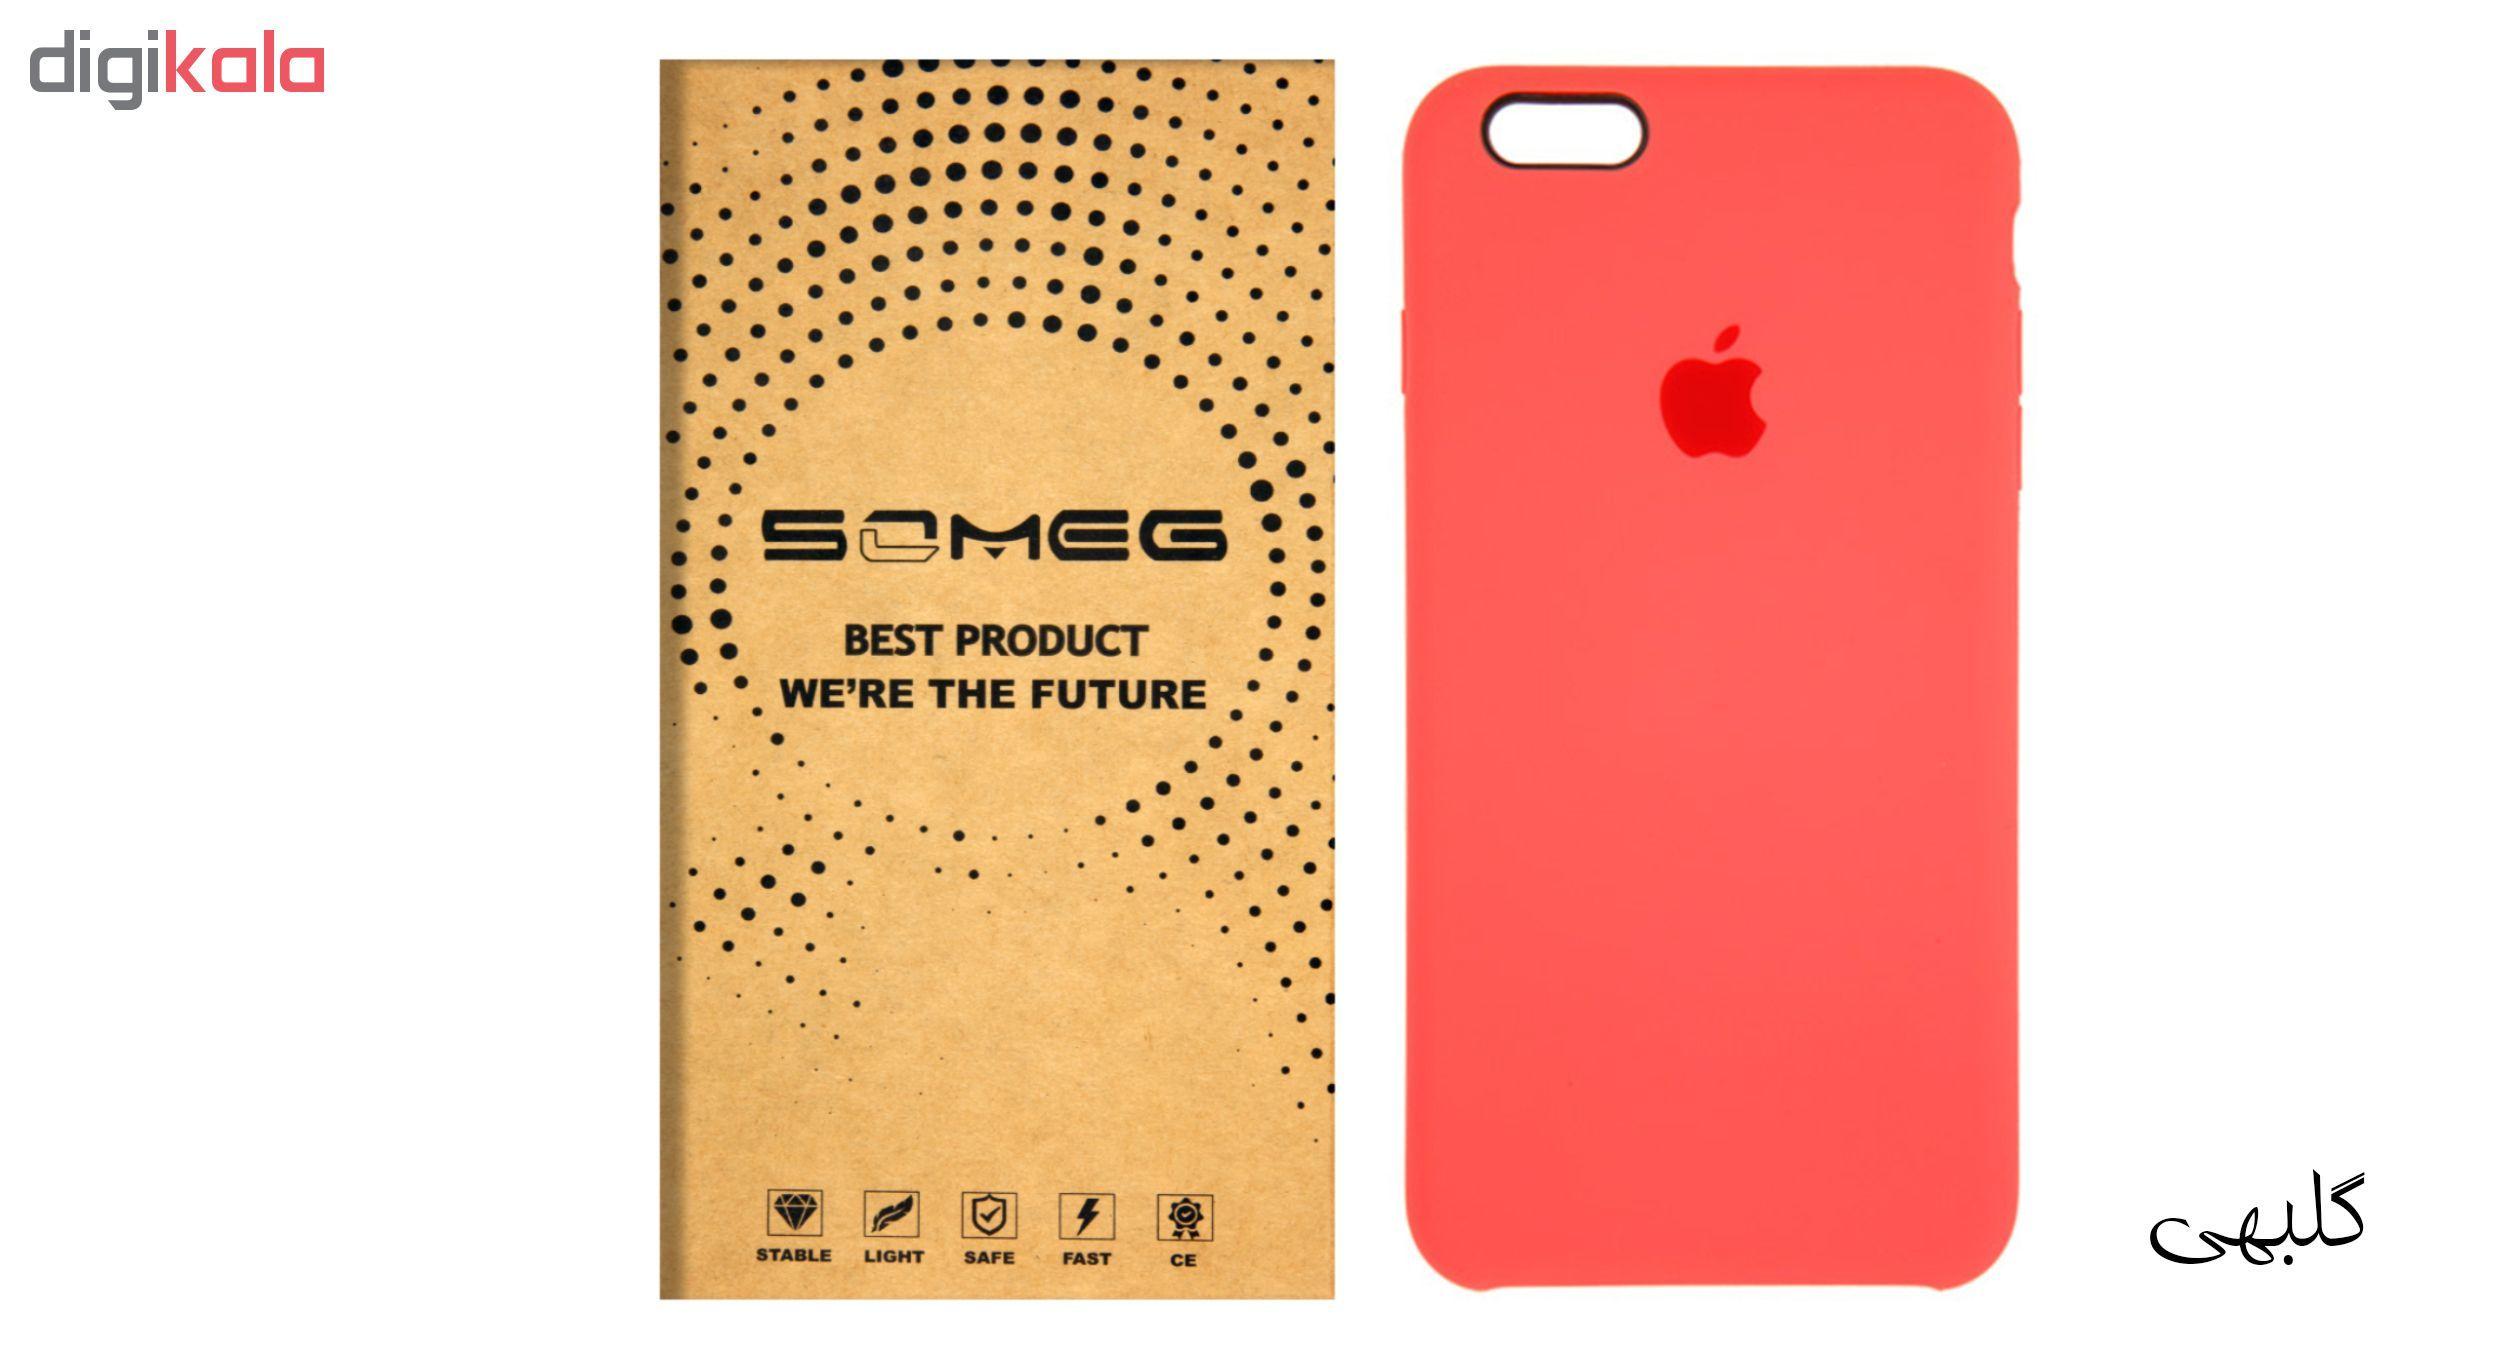 کاور سومگ مدل SIC مناسب برای گوشی موبایل اپل iPhone 6/6s main 1 25